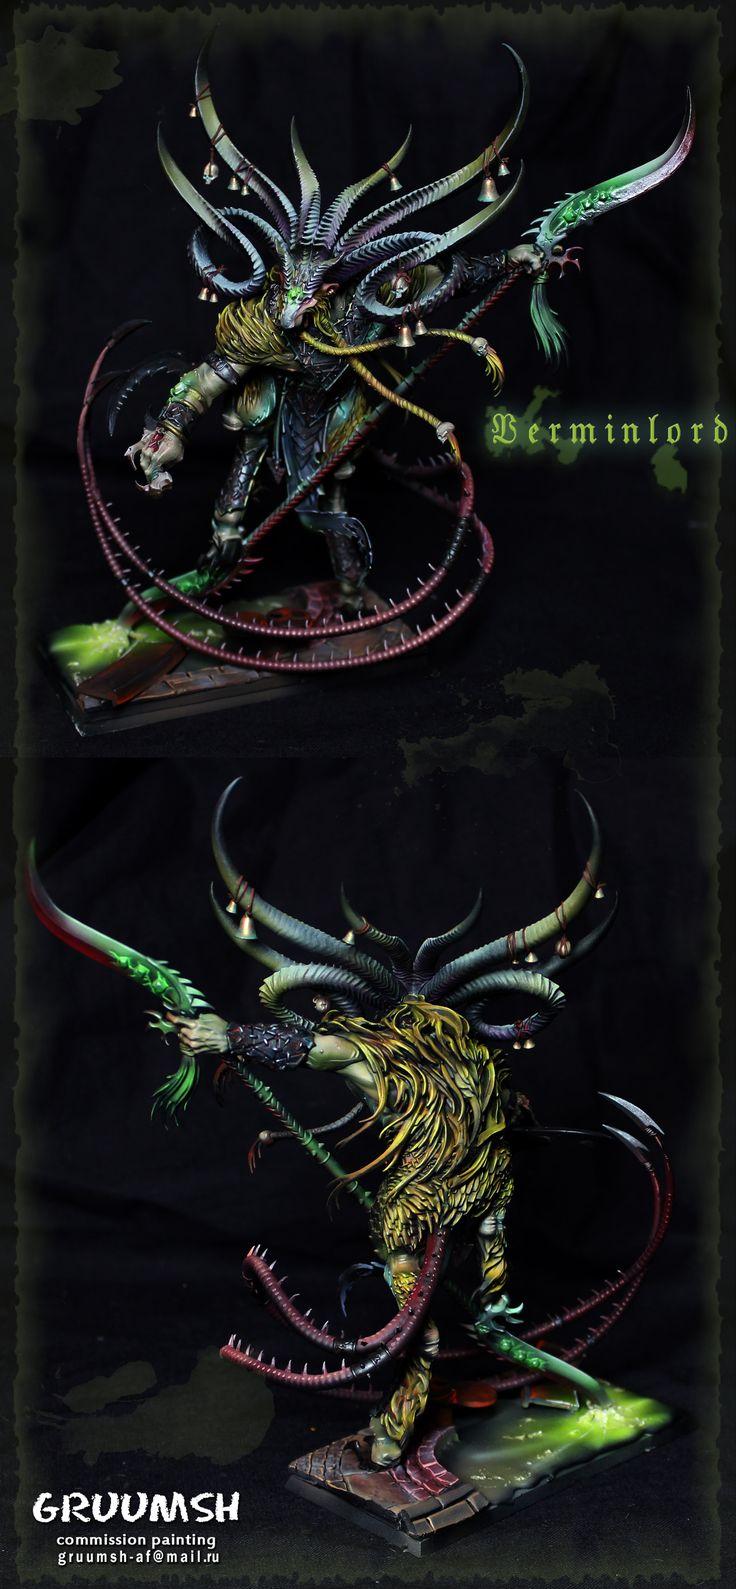 Warhammer FB | Skaven | Verminlord by Gruumsh #warhammer #ageofsigmar #aos #sigmar #wh #whfb #gw #gamesworkshop #wellofeternity #miniatures #wargaming #hobby #fantasy